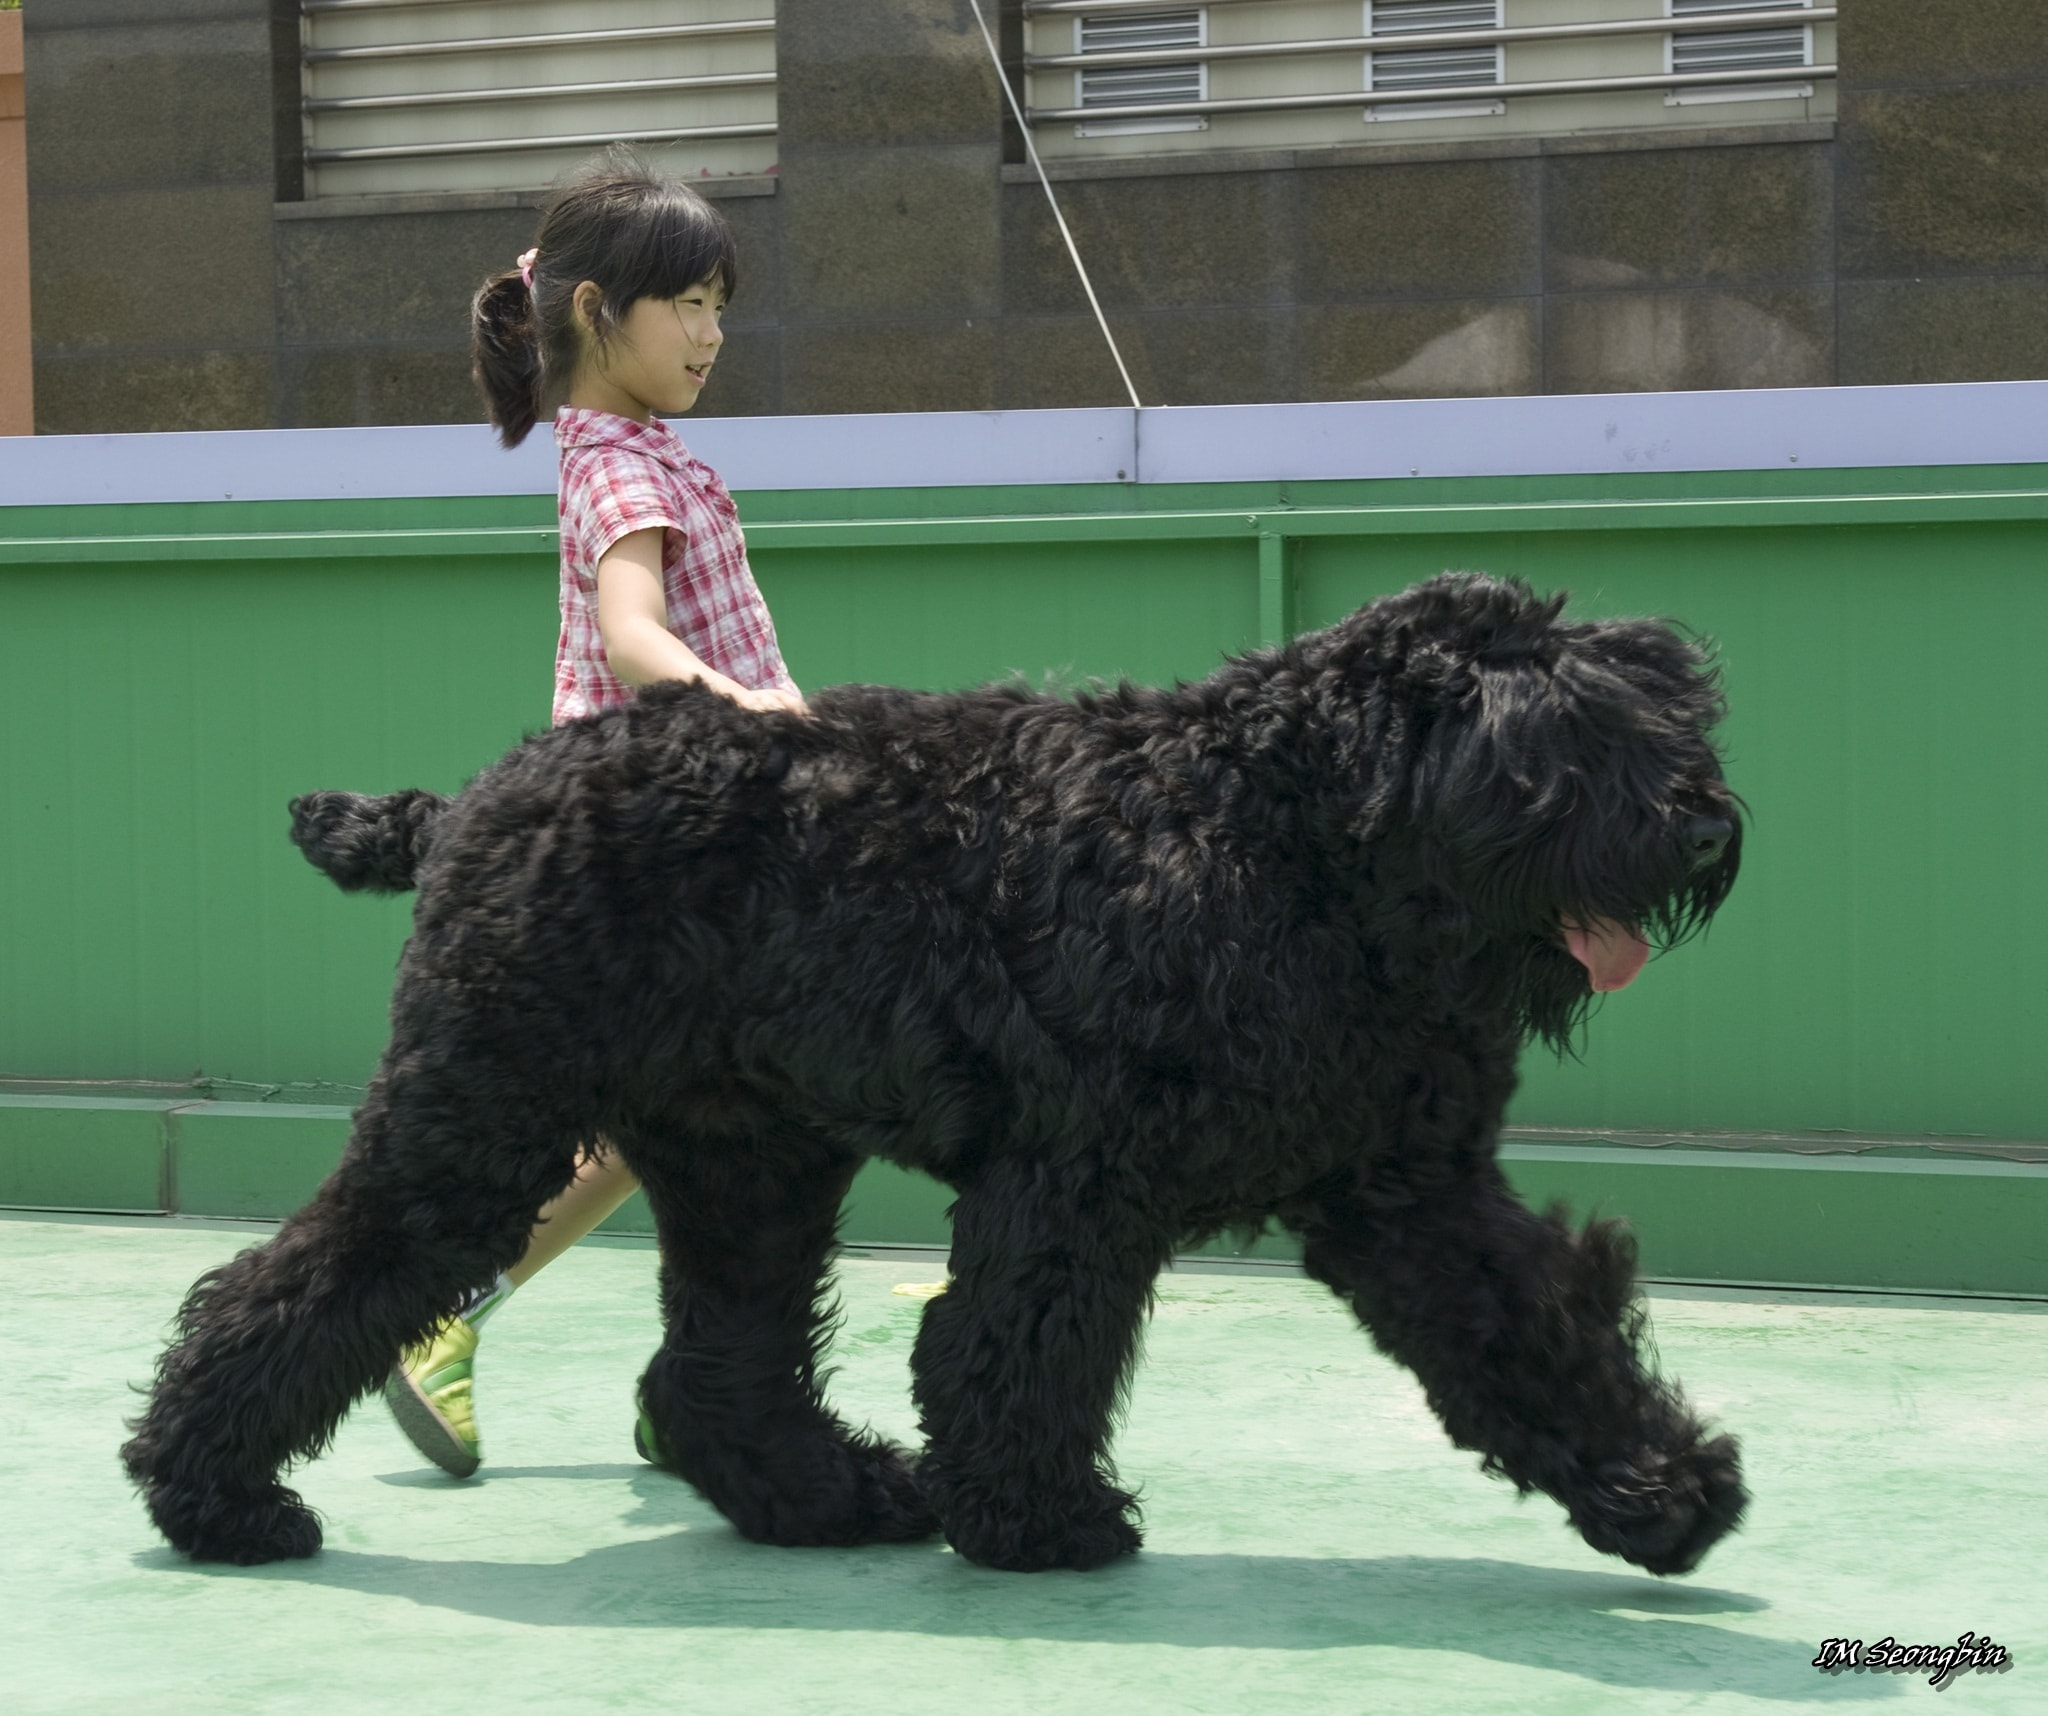 Black Russian Terrier Wallpapers hd